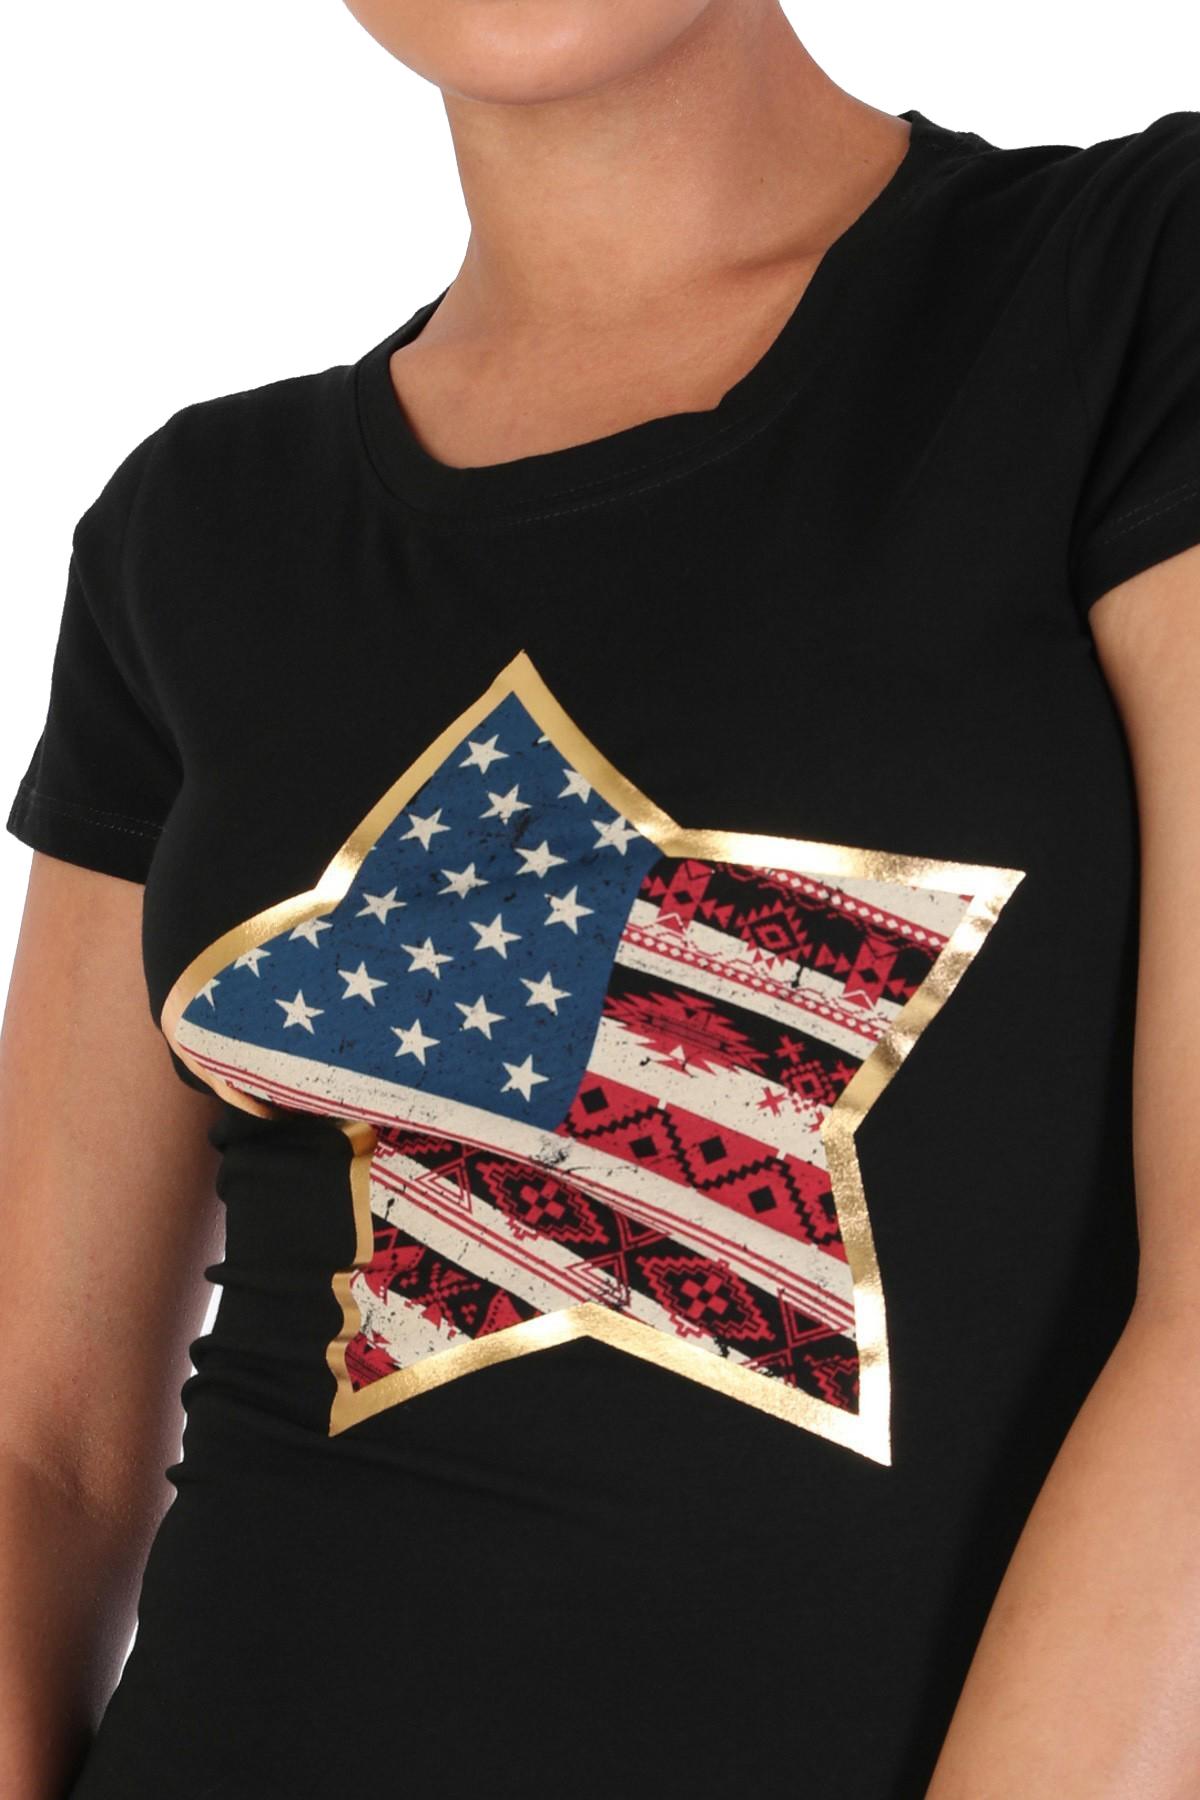 Women-039-s-Juniors-Patriotic-Casual-Graphic-Print-Short-Sleeve-T-Shirt-Top thumbnail 5